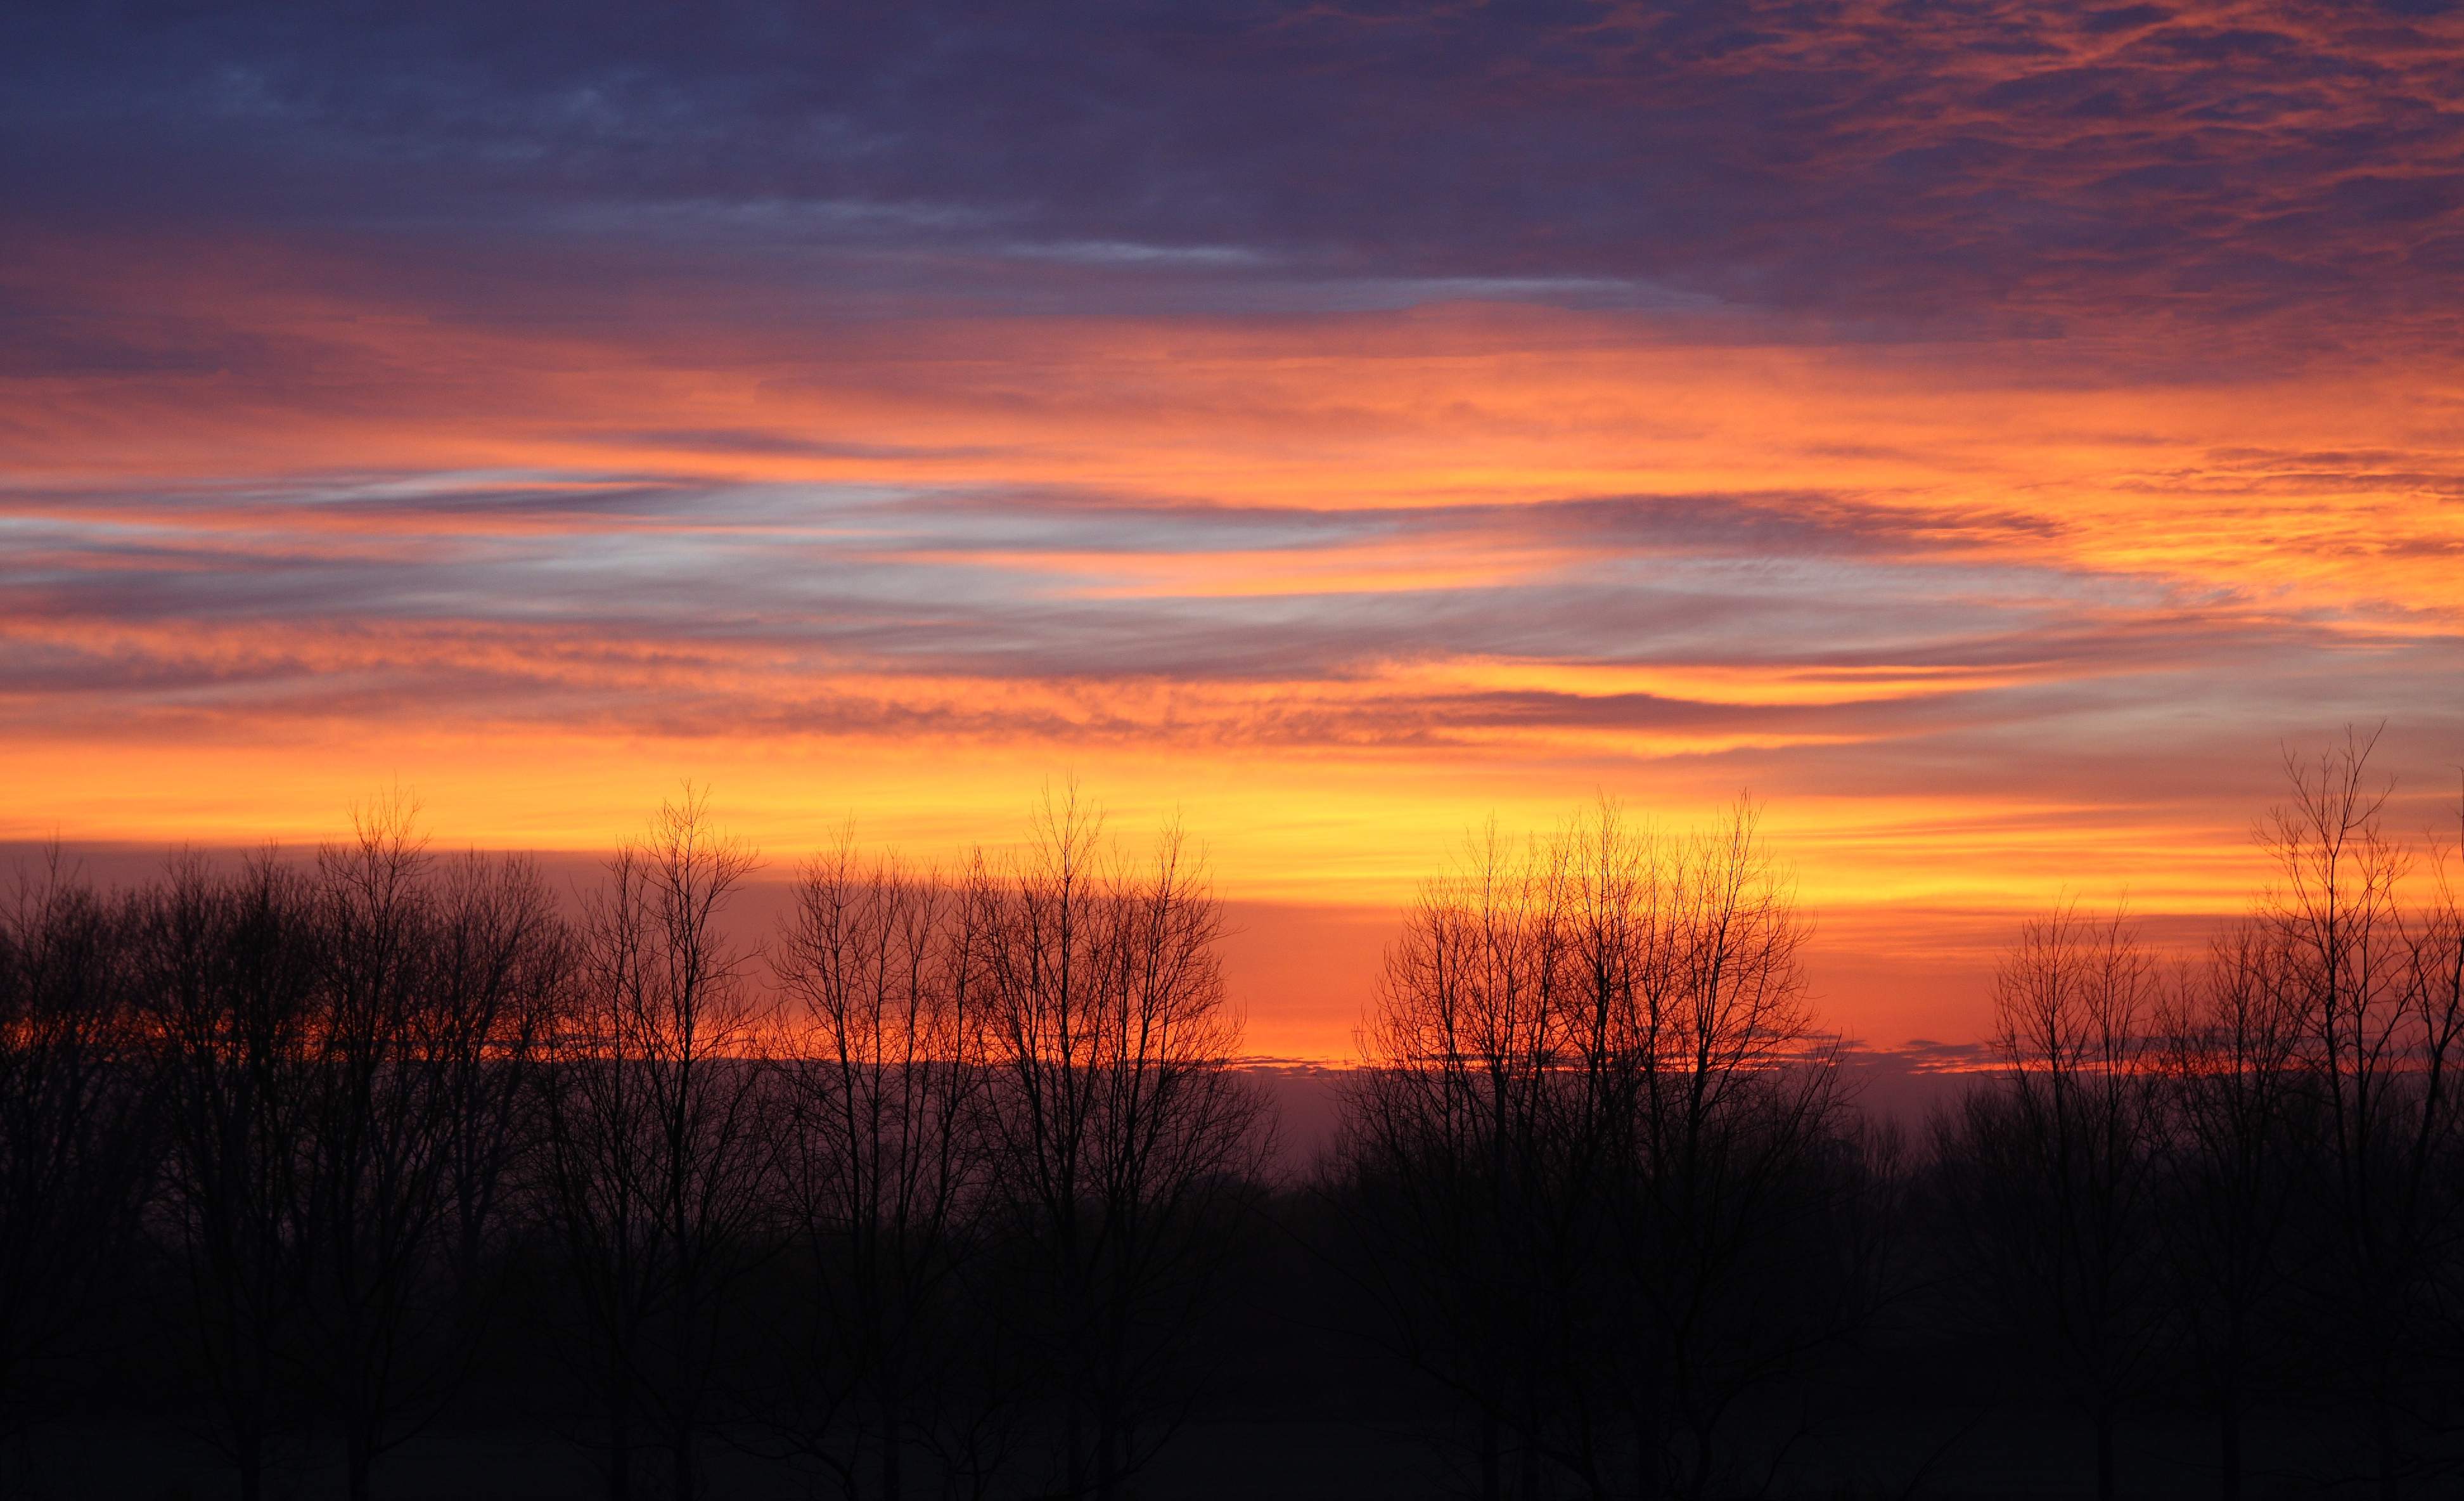 Beautiful Morning wallpaper | 1280x1024 | #29371